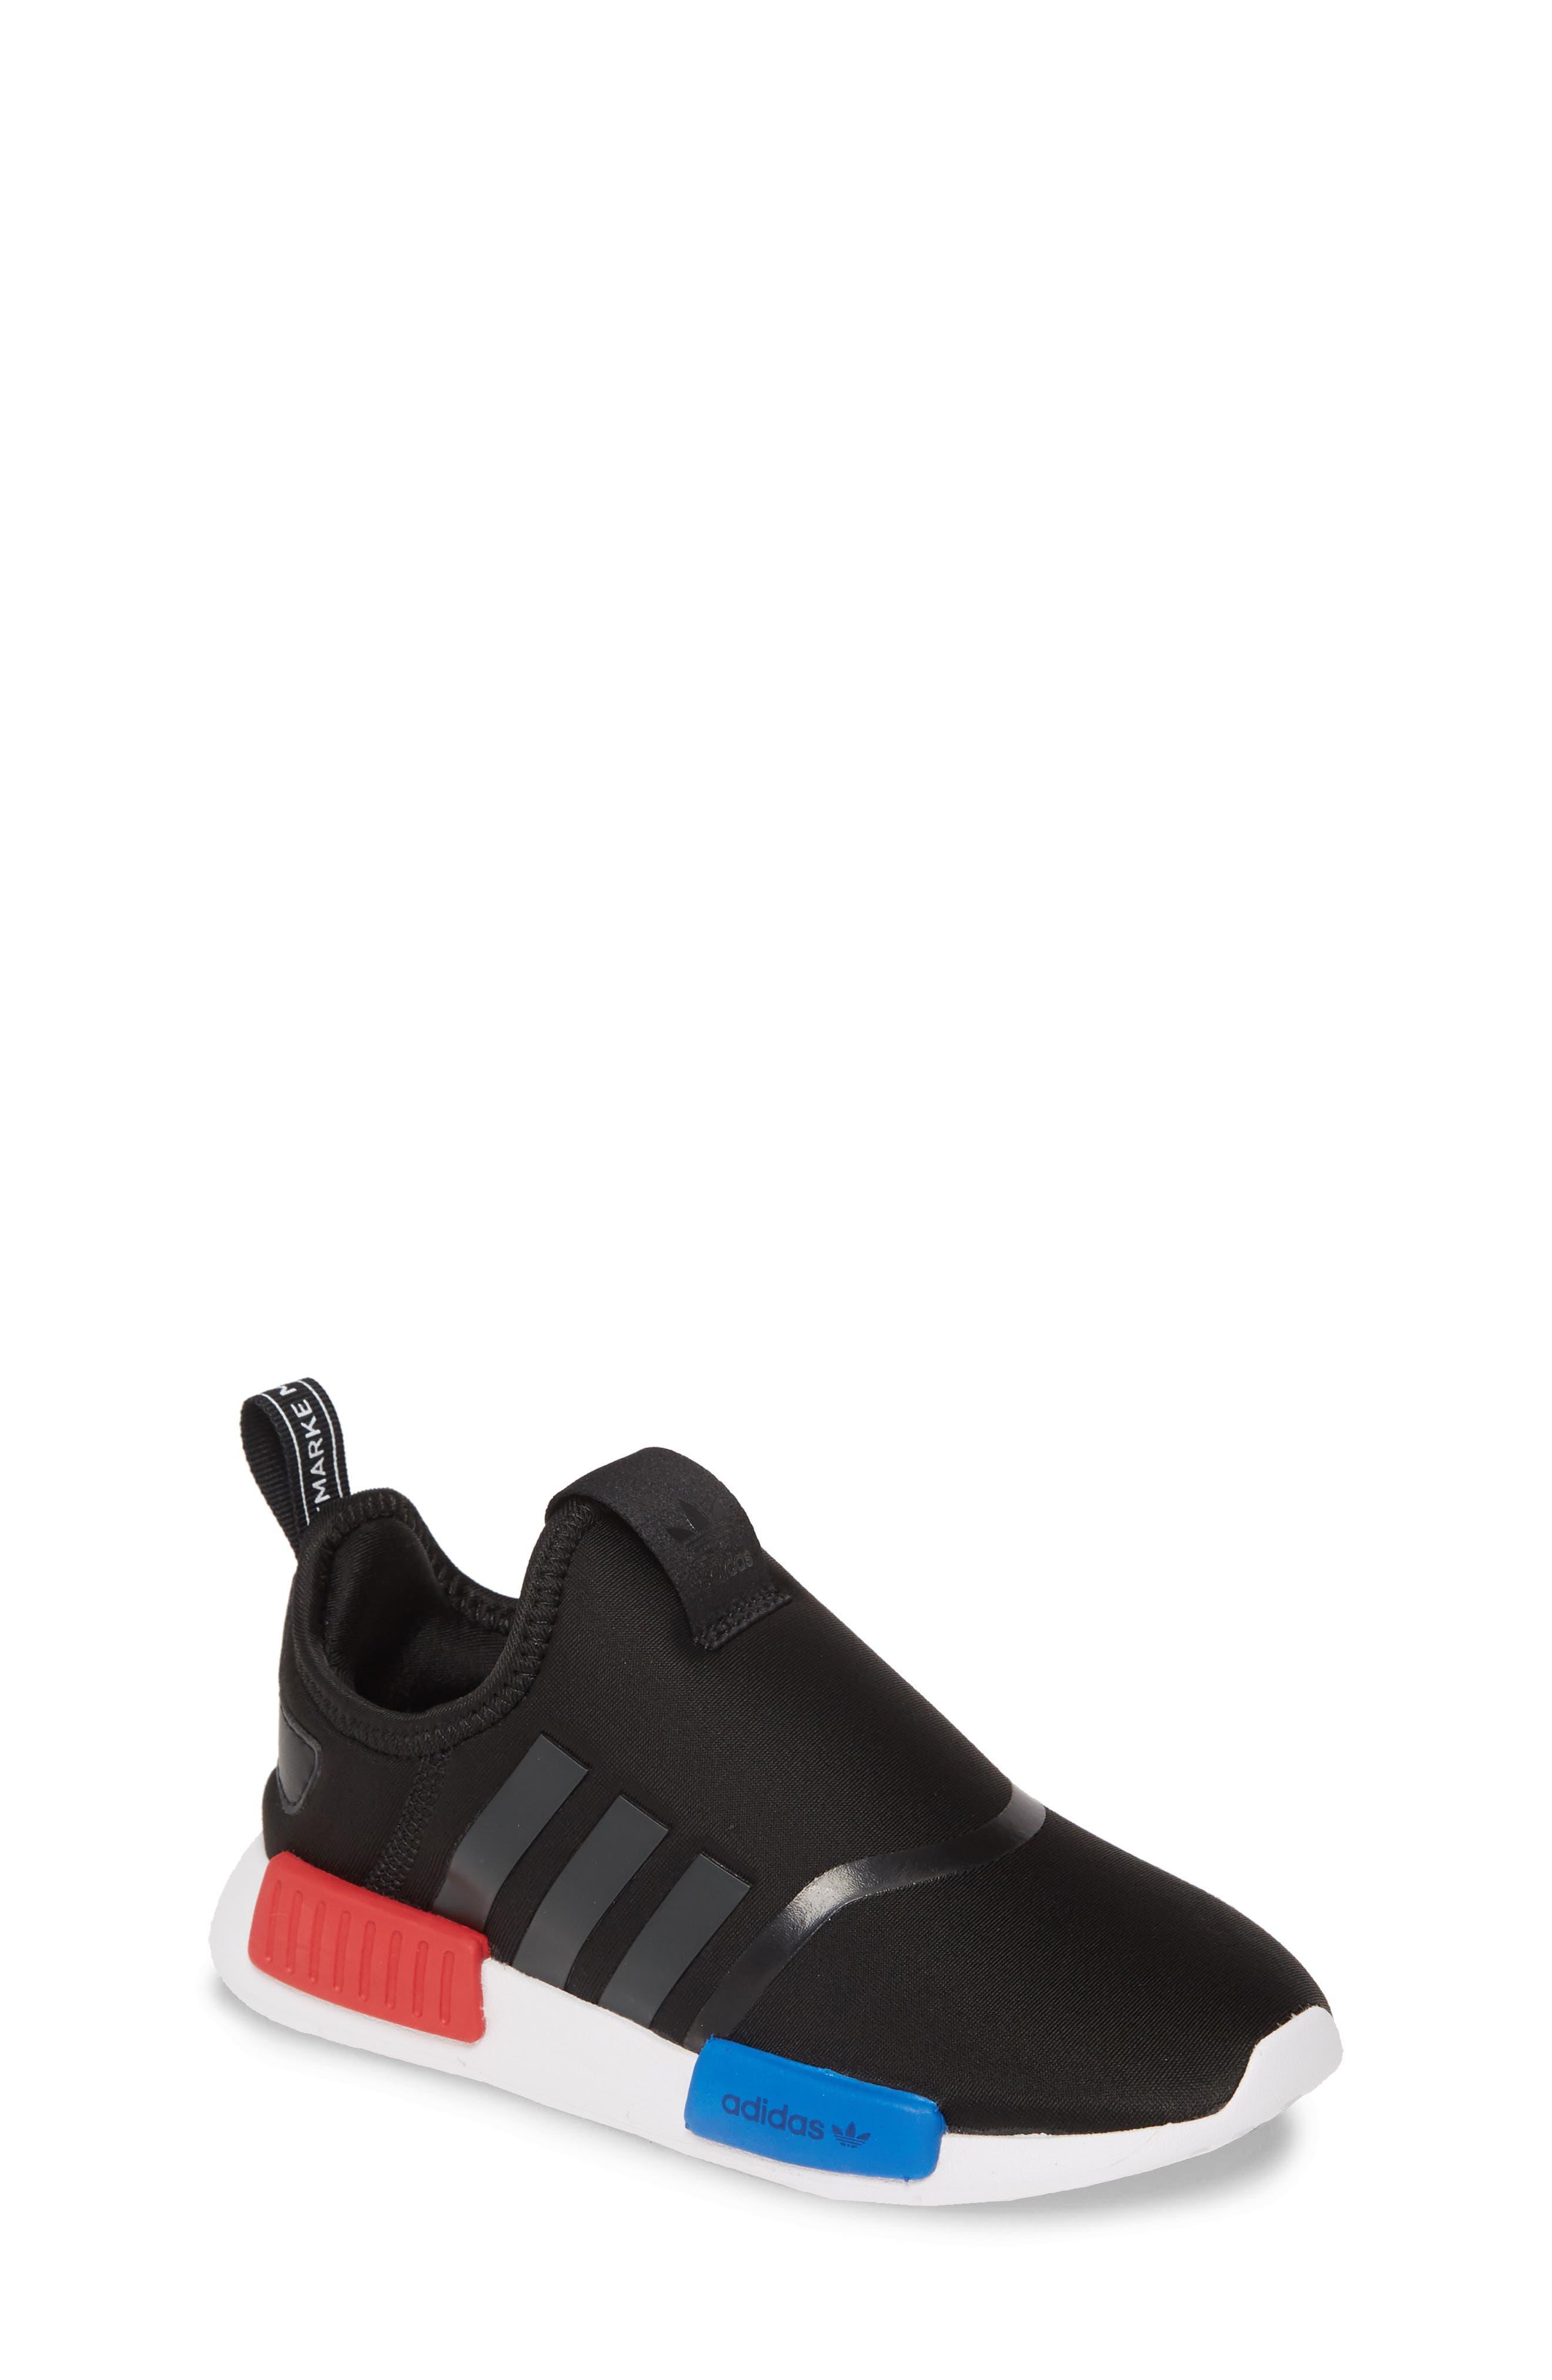 "ADIDAS NMD CS1 PK ""BASE GREEN"" $79.00 Sneaker Steal  Sneaker Steal"